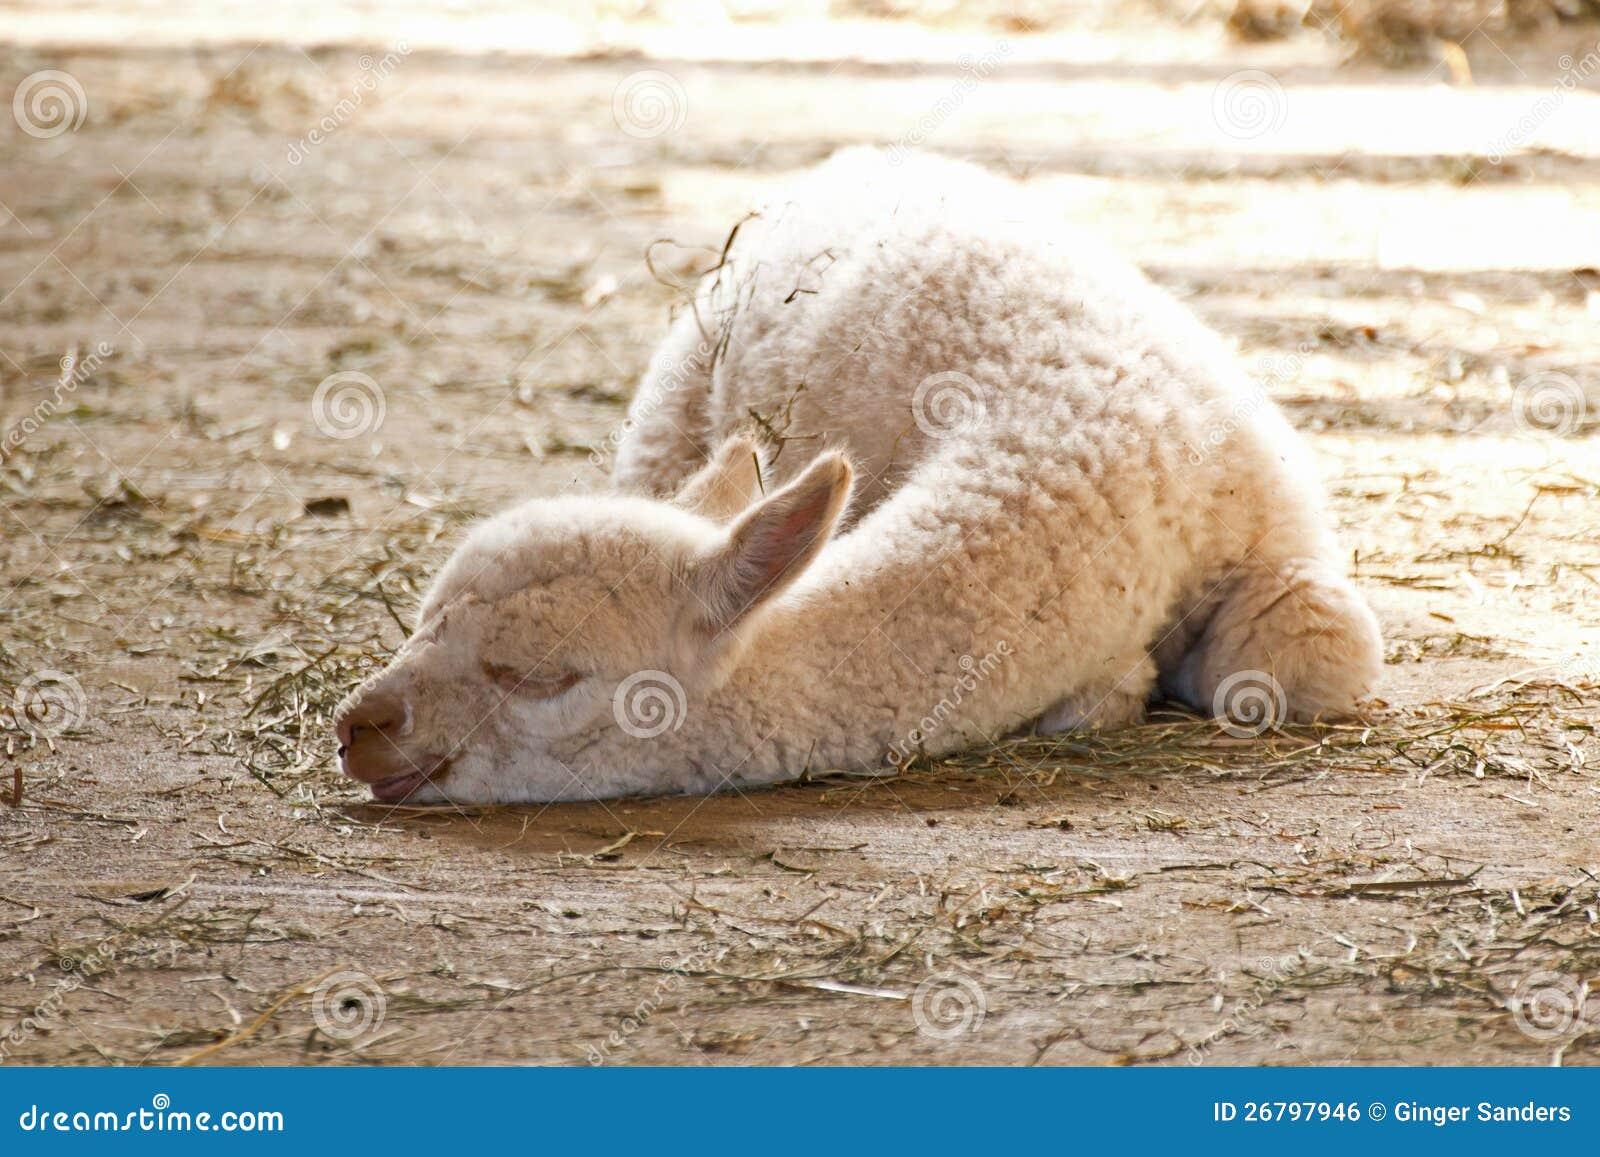 White Baby Alpaca Sleeping In Sun Royalty Free Stock Image